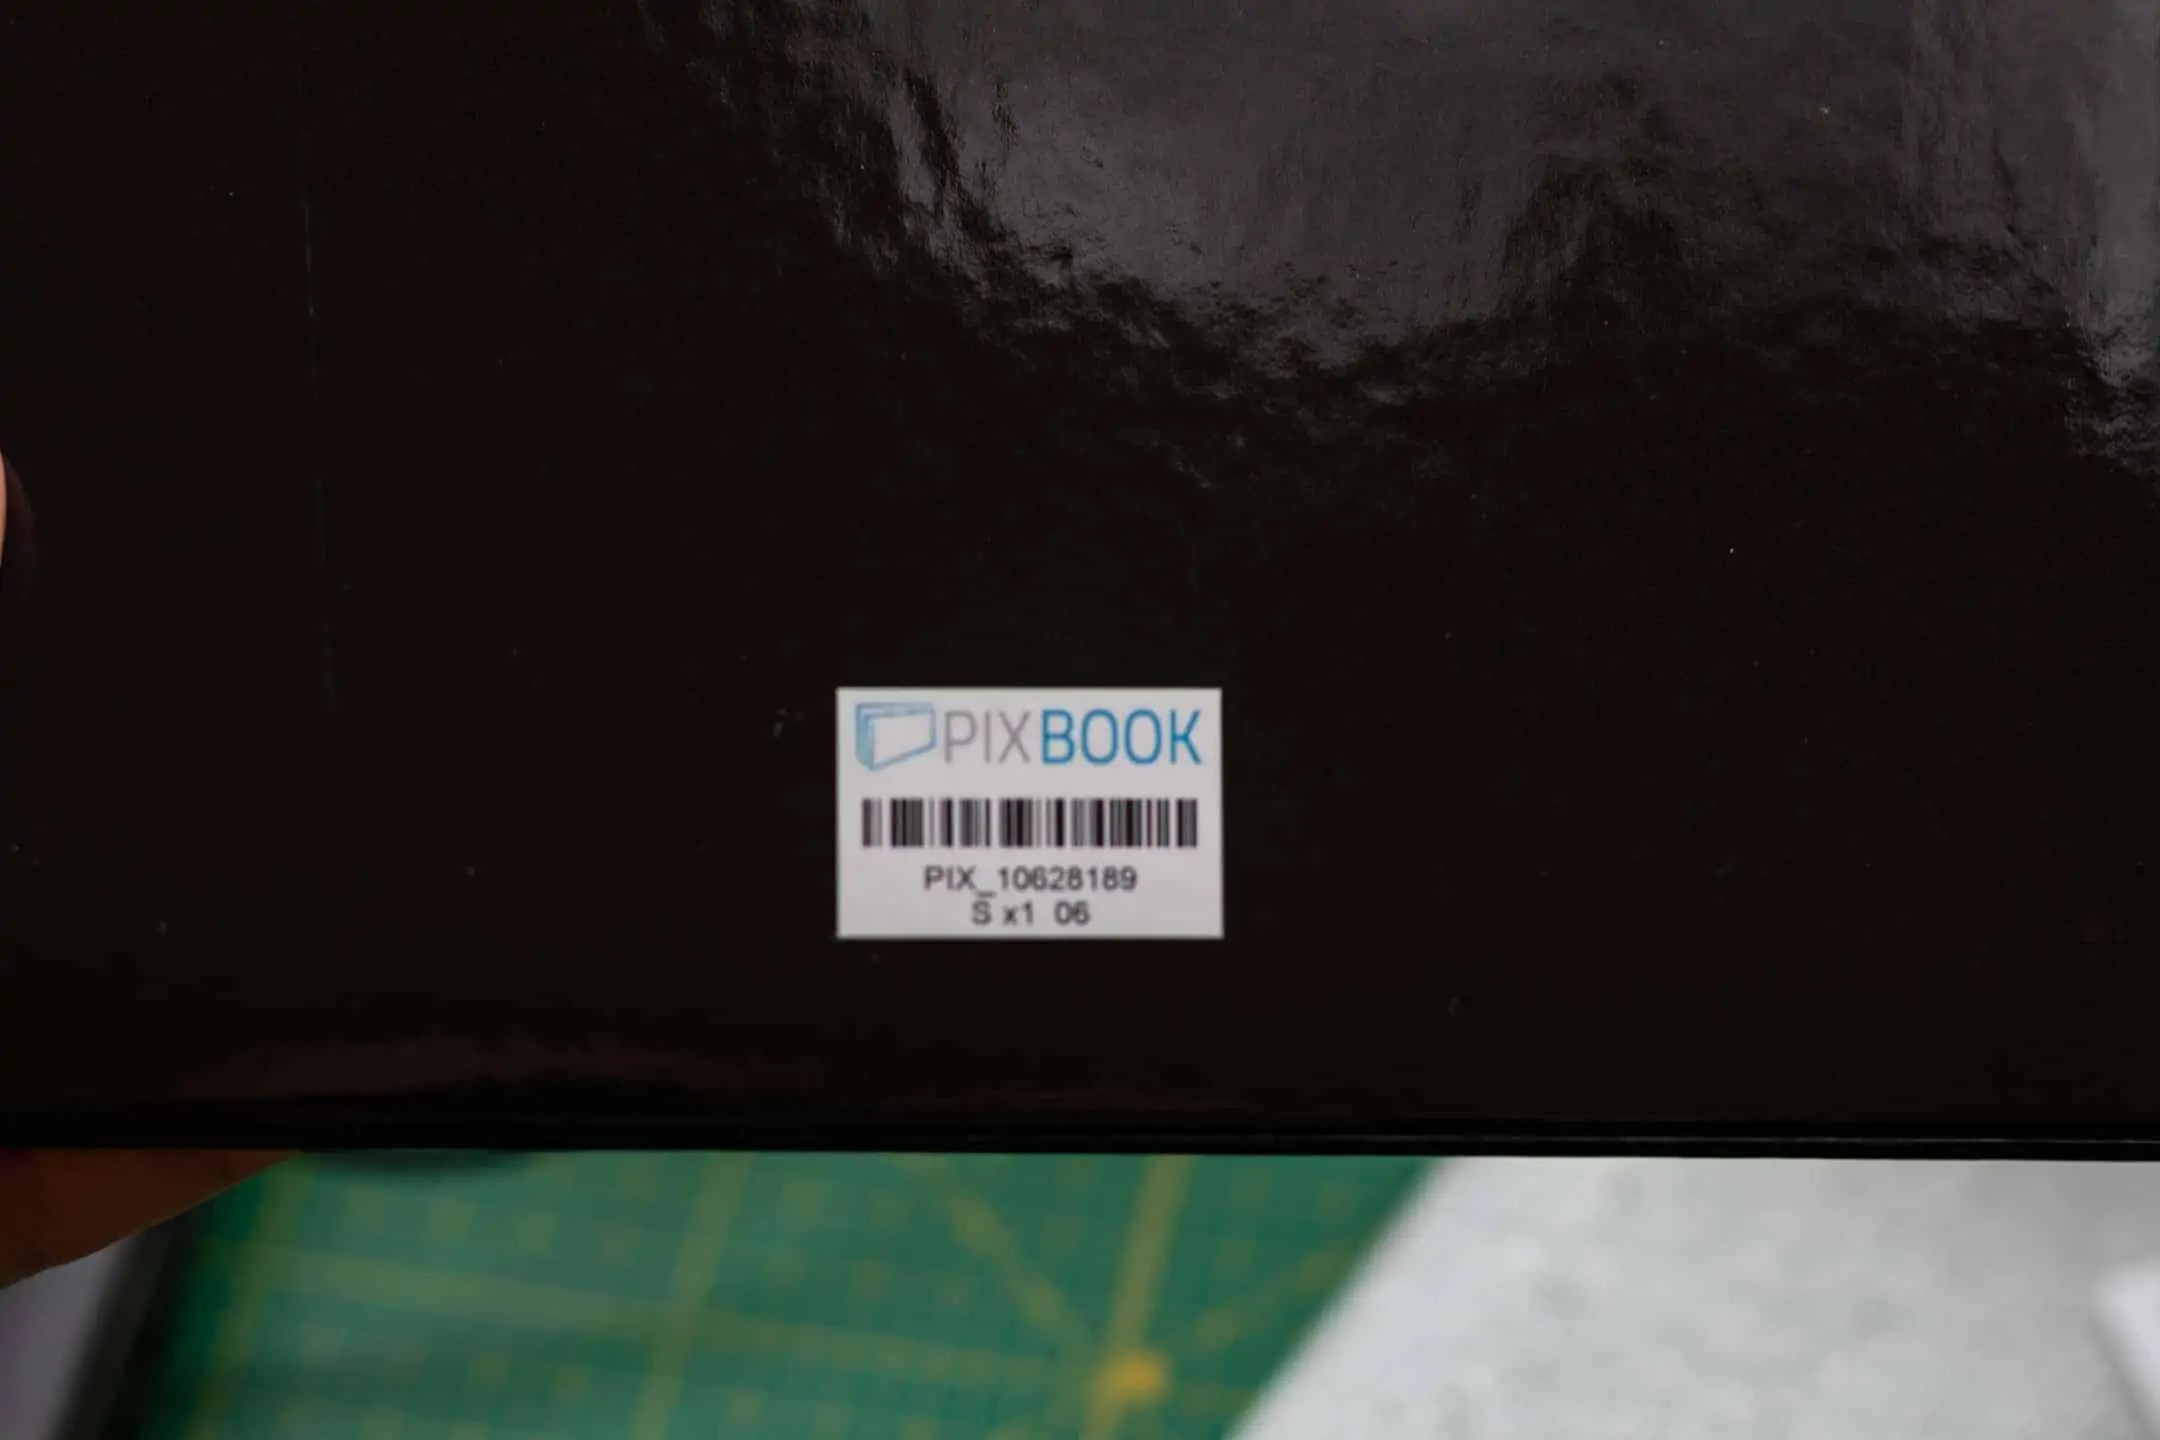 Saal design vs pixbook porównanie książek fotograficznych 13 - Saal design, pixbook - książki fotograficzne